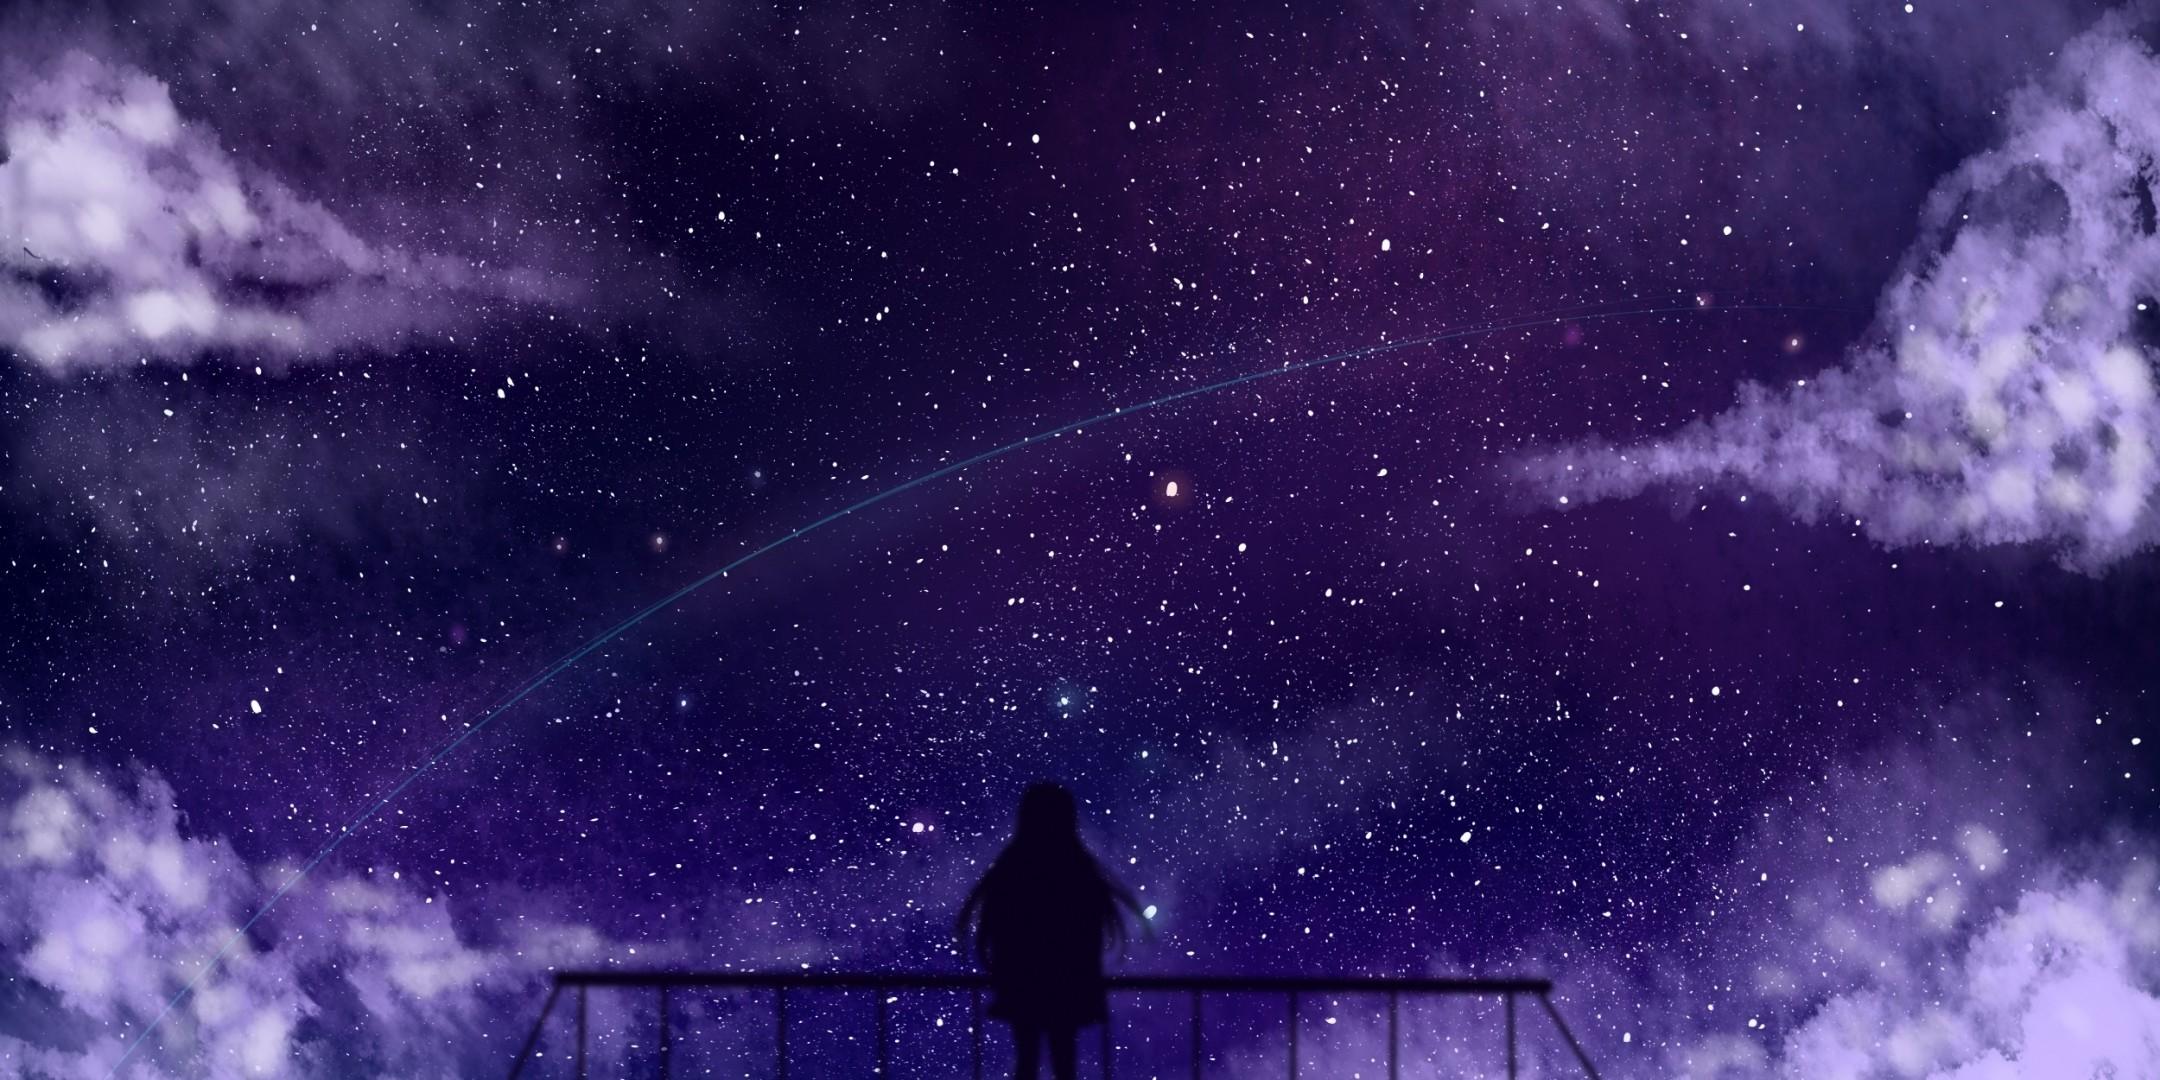 Anime Girl Stars Clouds Fence Silhouette Anime Stars Wallpaper Hd 2160x1080 Wallpaper Teahub Io